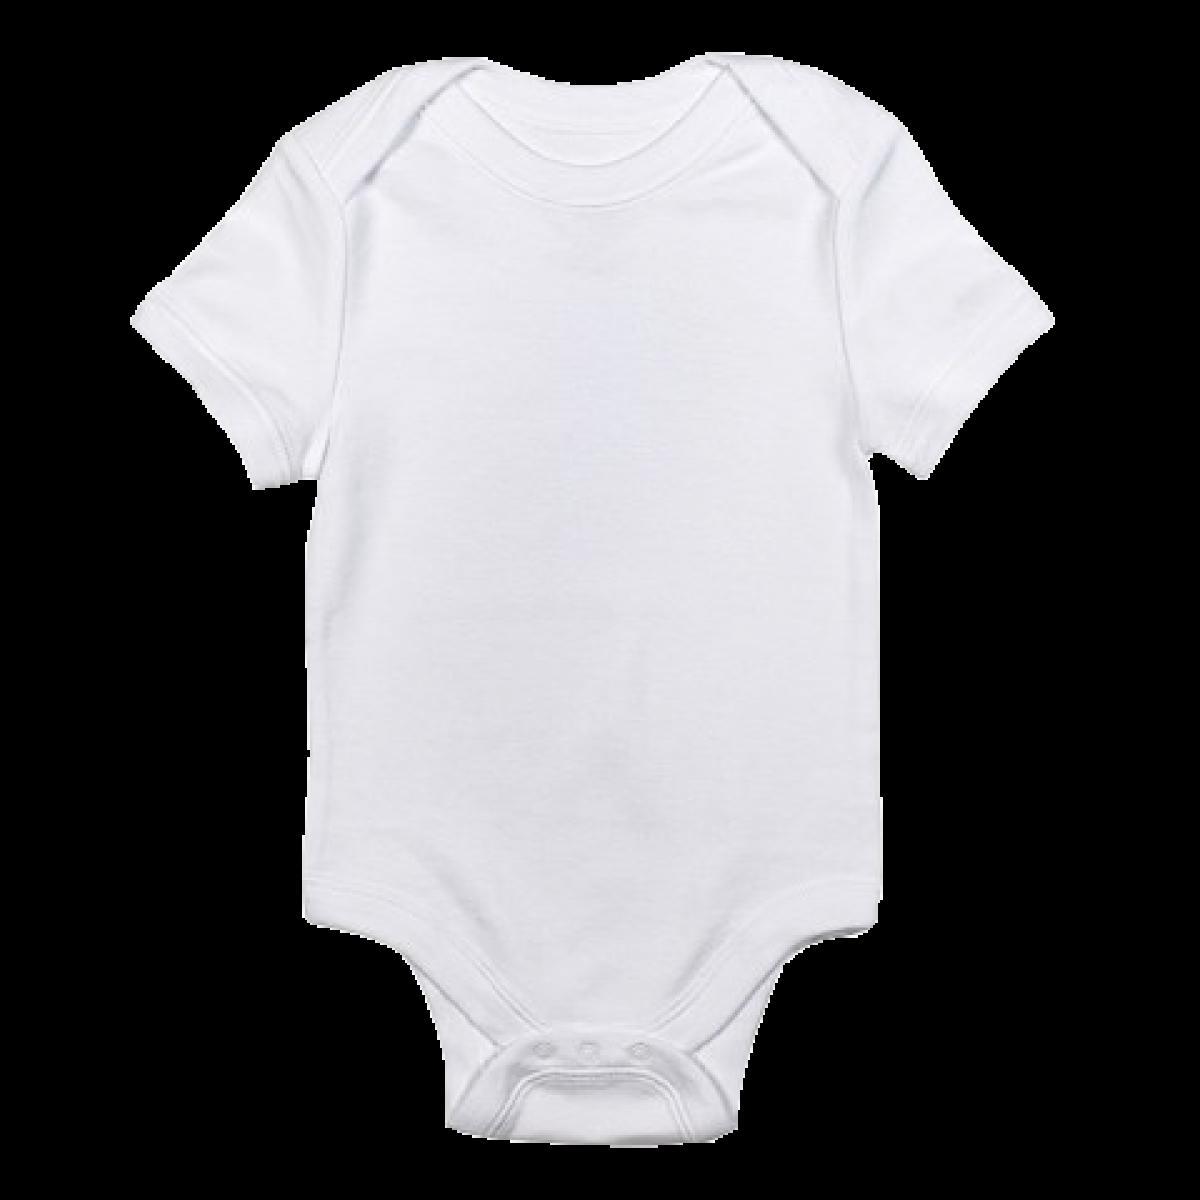 Baby onesie template car interior design